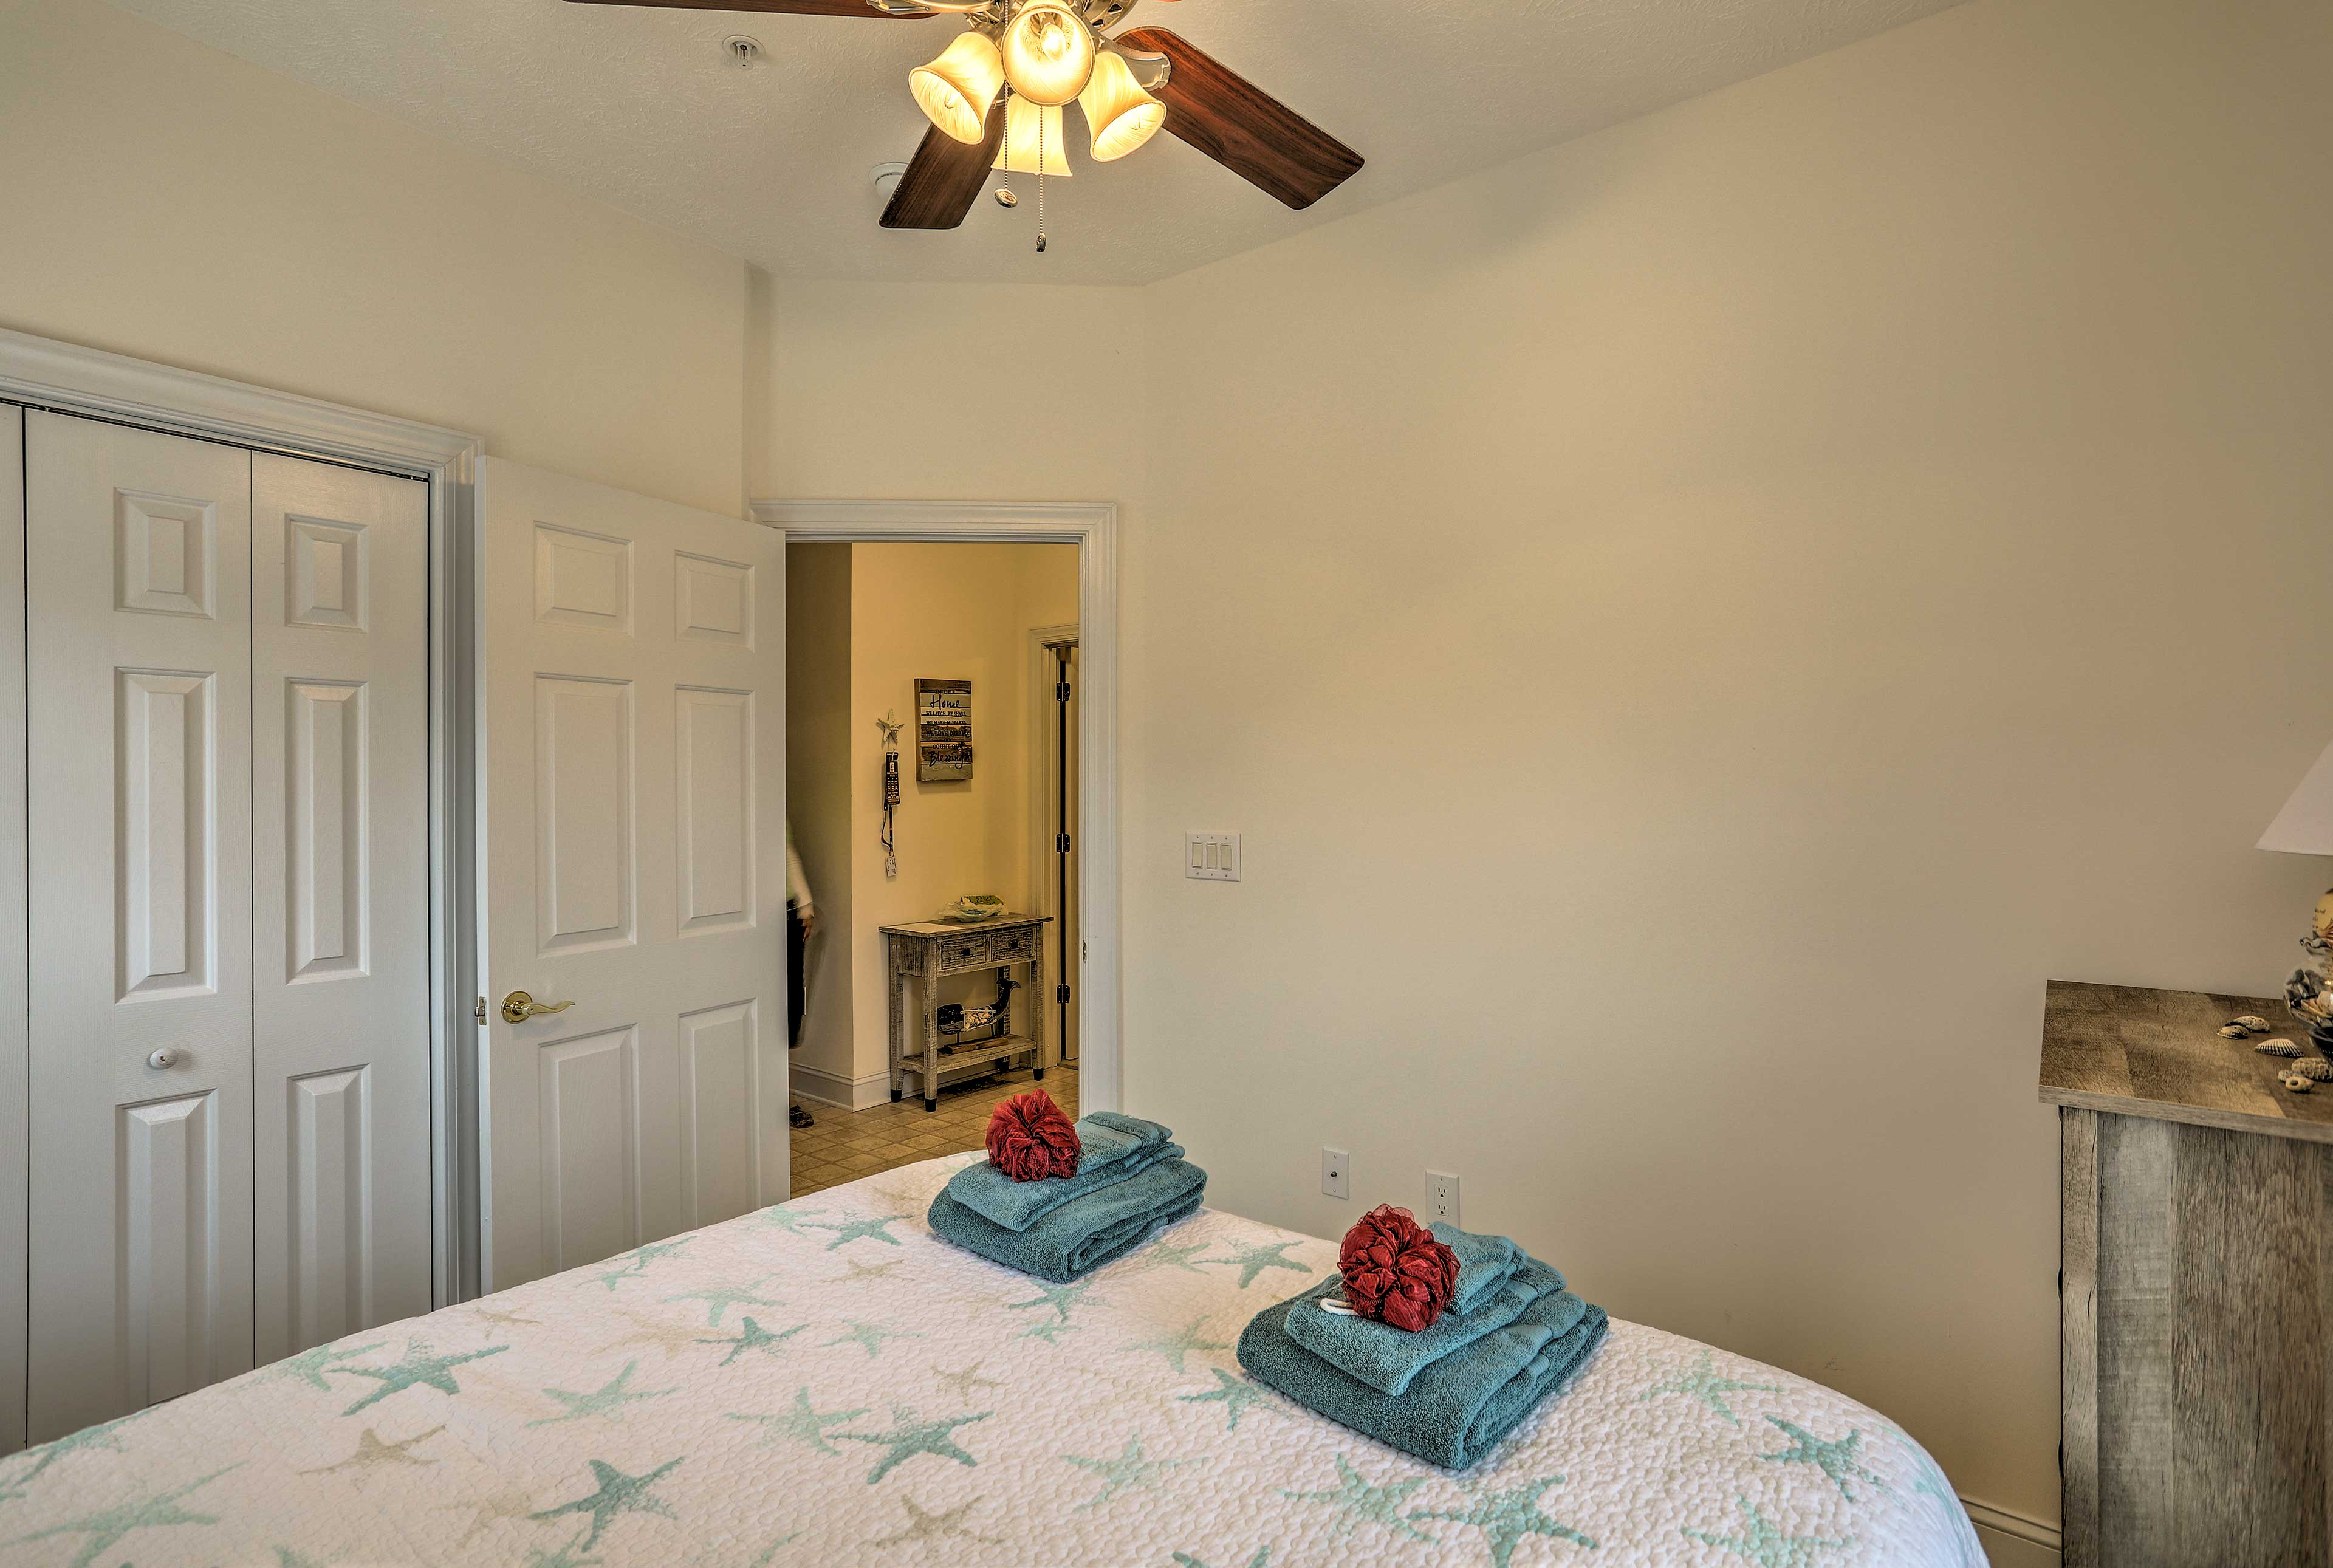 Both bedrooms offer a queen bed.